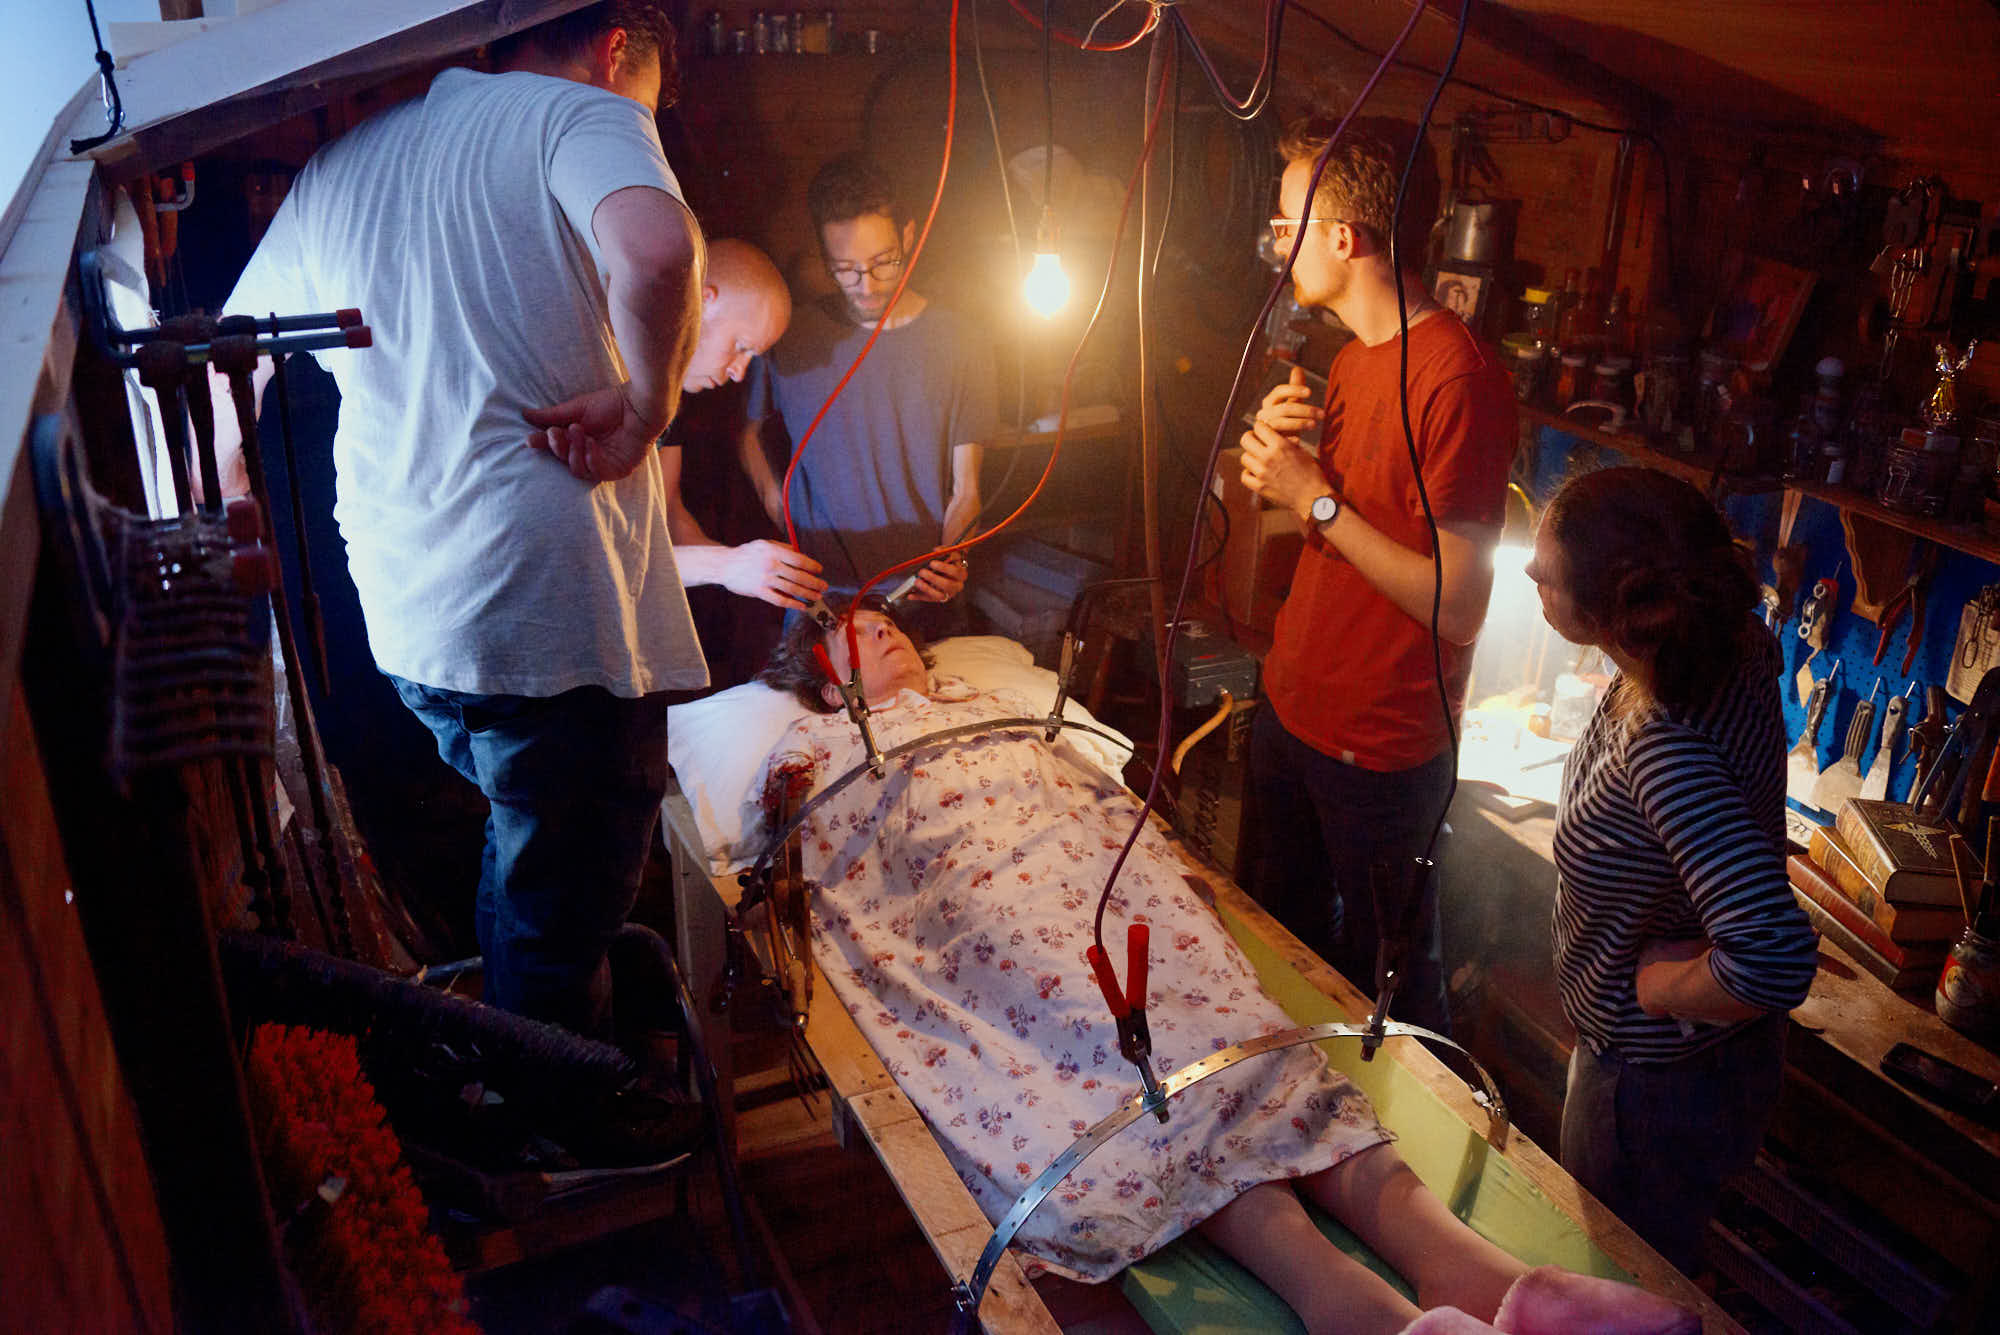 Cast Behind the Scenes _Frank & Mary Stills_ by Suzi Corker_24.jpg